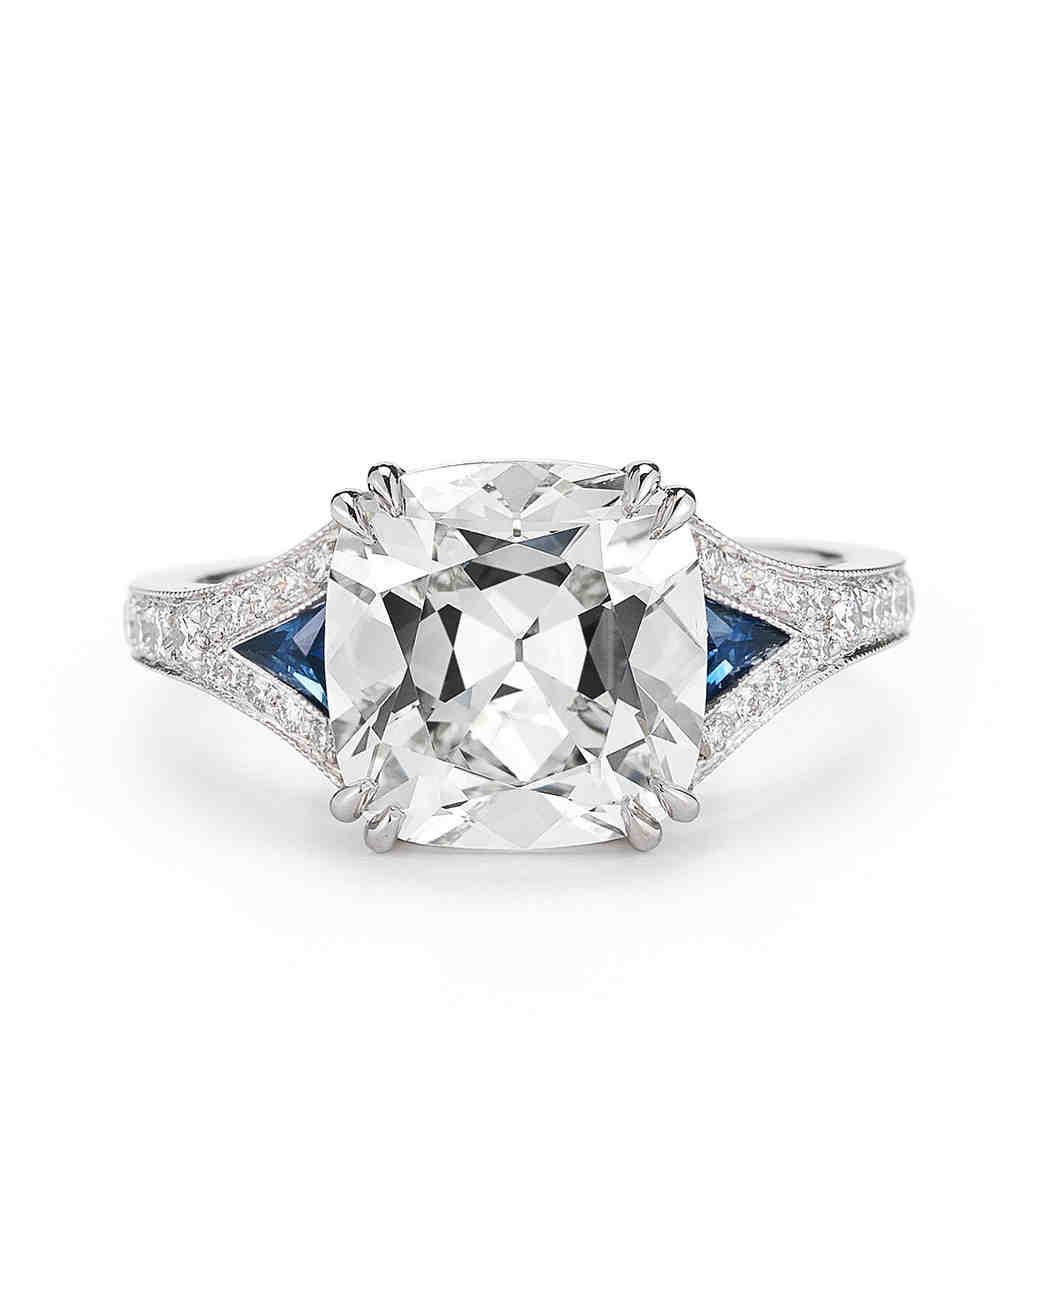 McTeigue & McClelland Antique Cushion-Cut Engagement Ring with Blue Sapphires